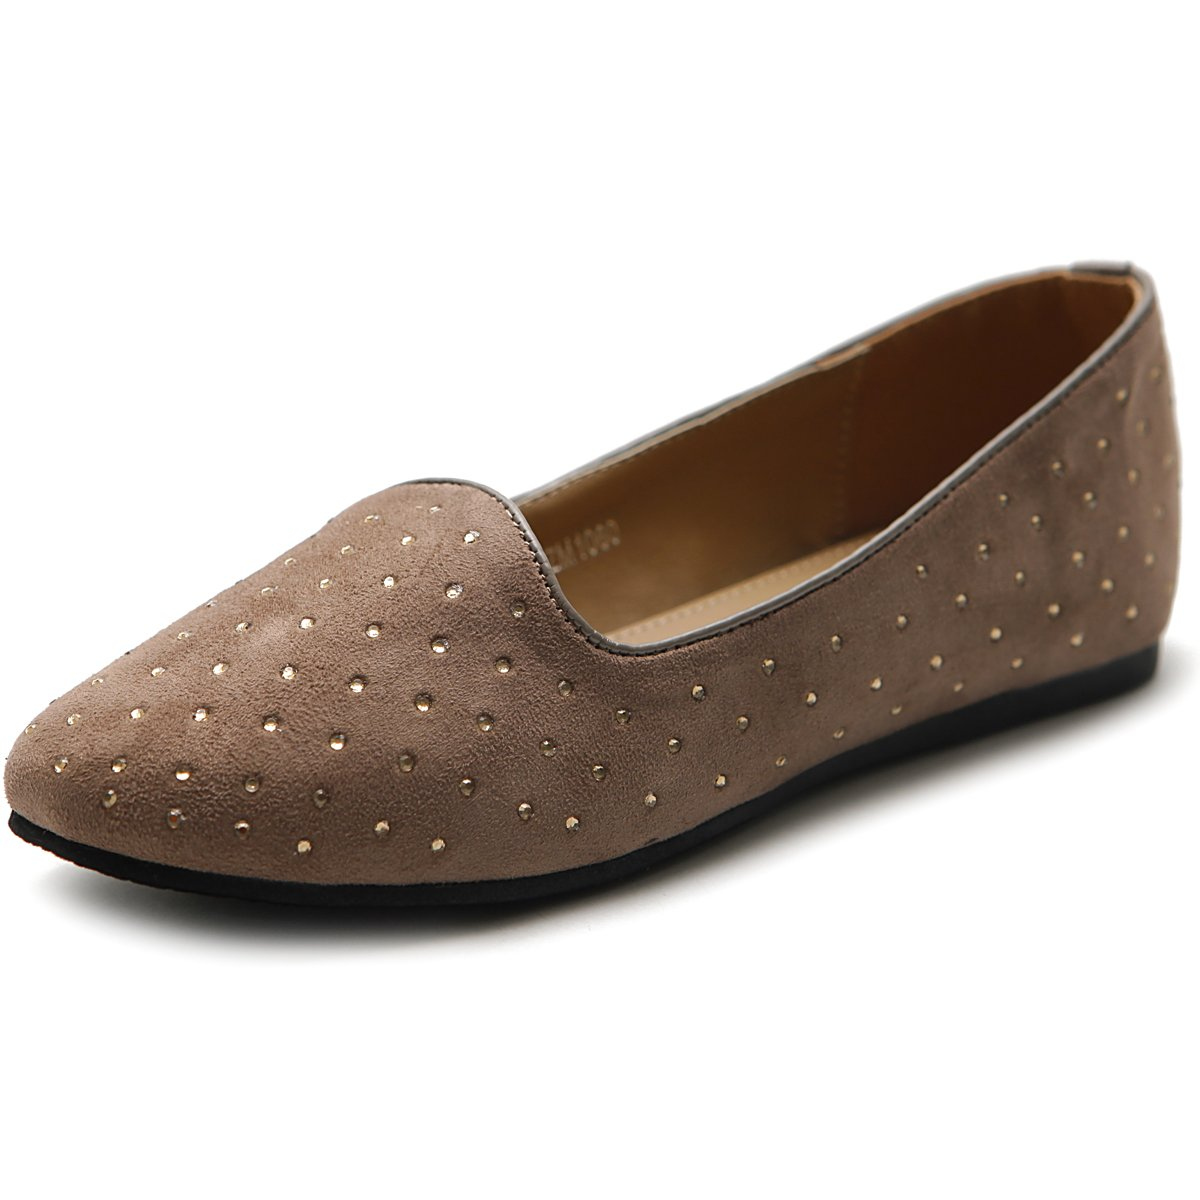 Ollio Women's Shoe Ballet Suede Jewel Stud Comfort Flat B00MV4EDKG 7.5 B(M) US|Mocha B